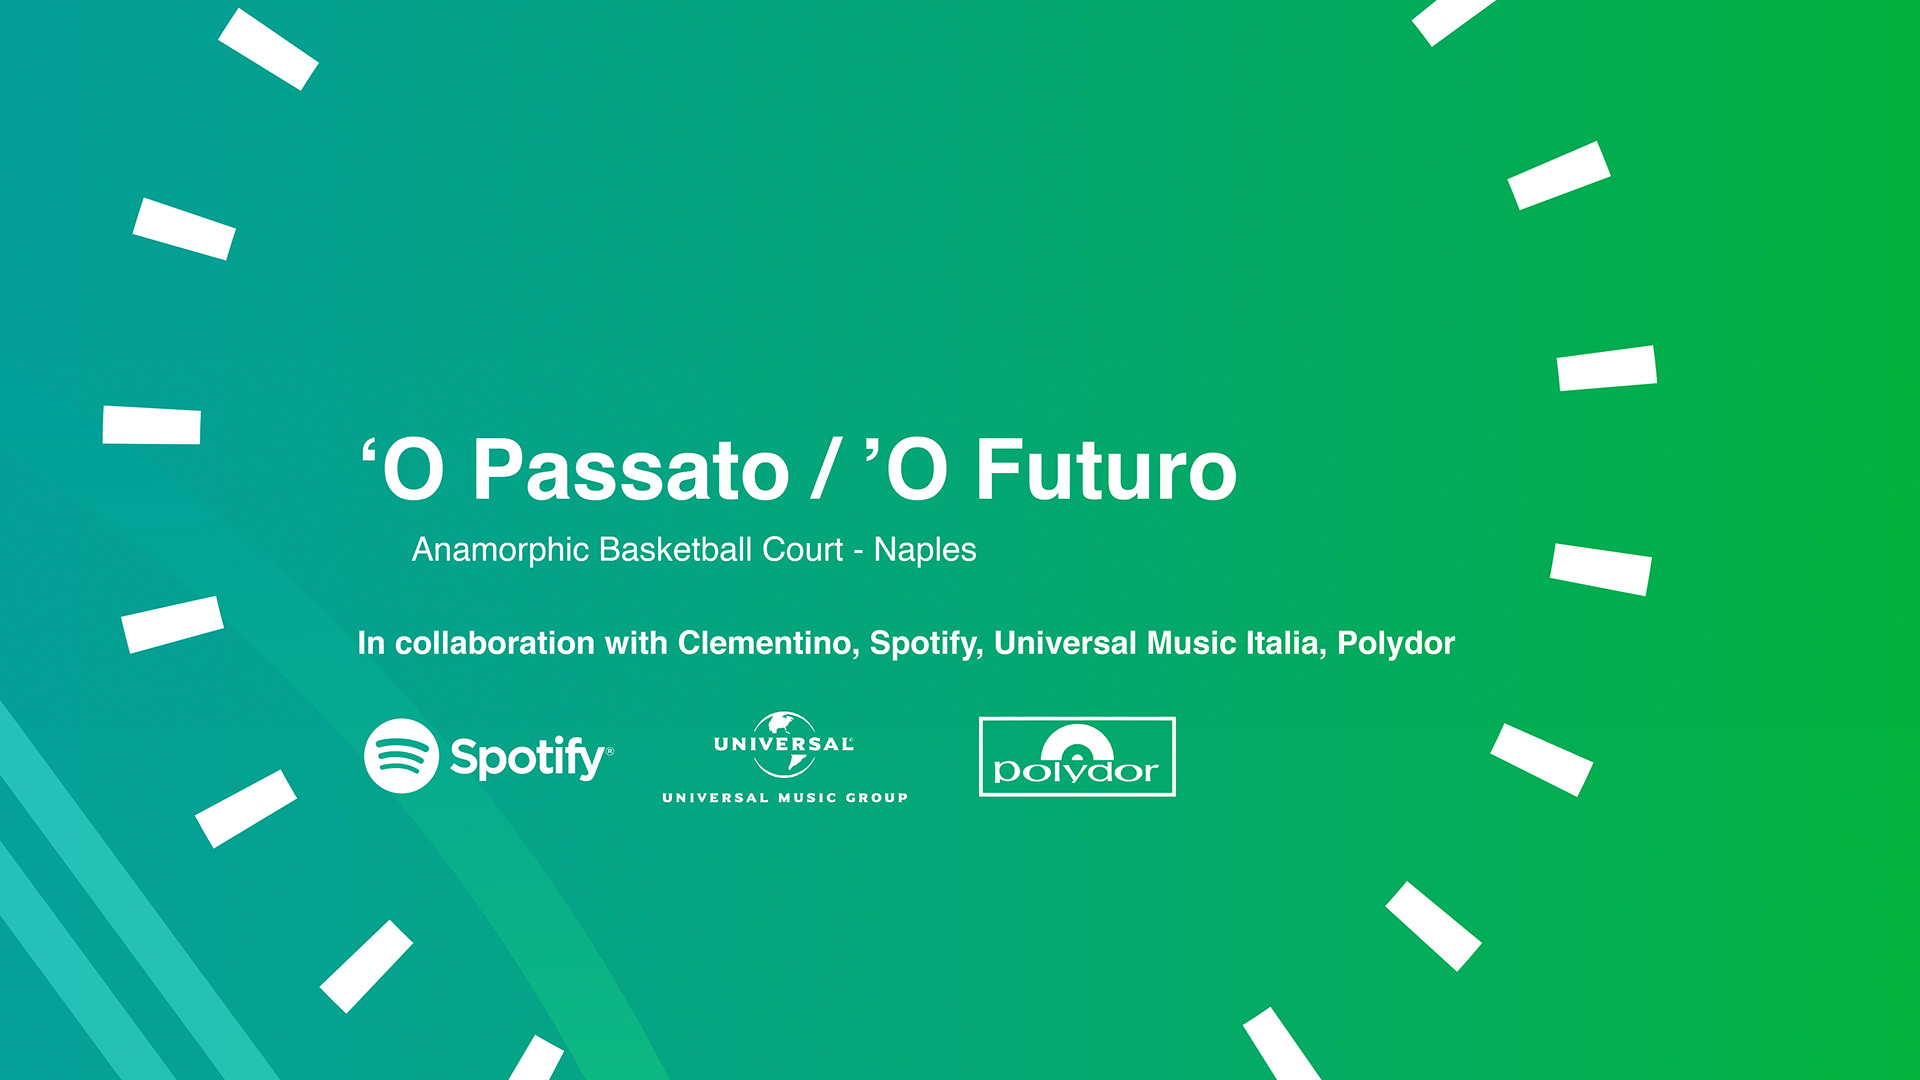 Illusory Basketball Court: O Passato / 'O Futuro - Street Art